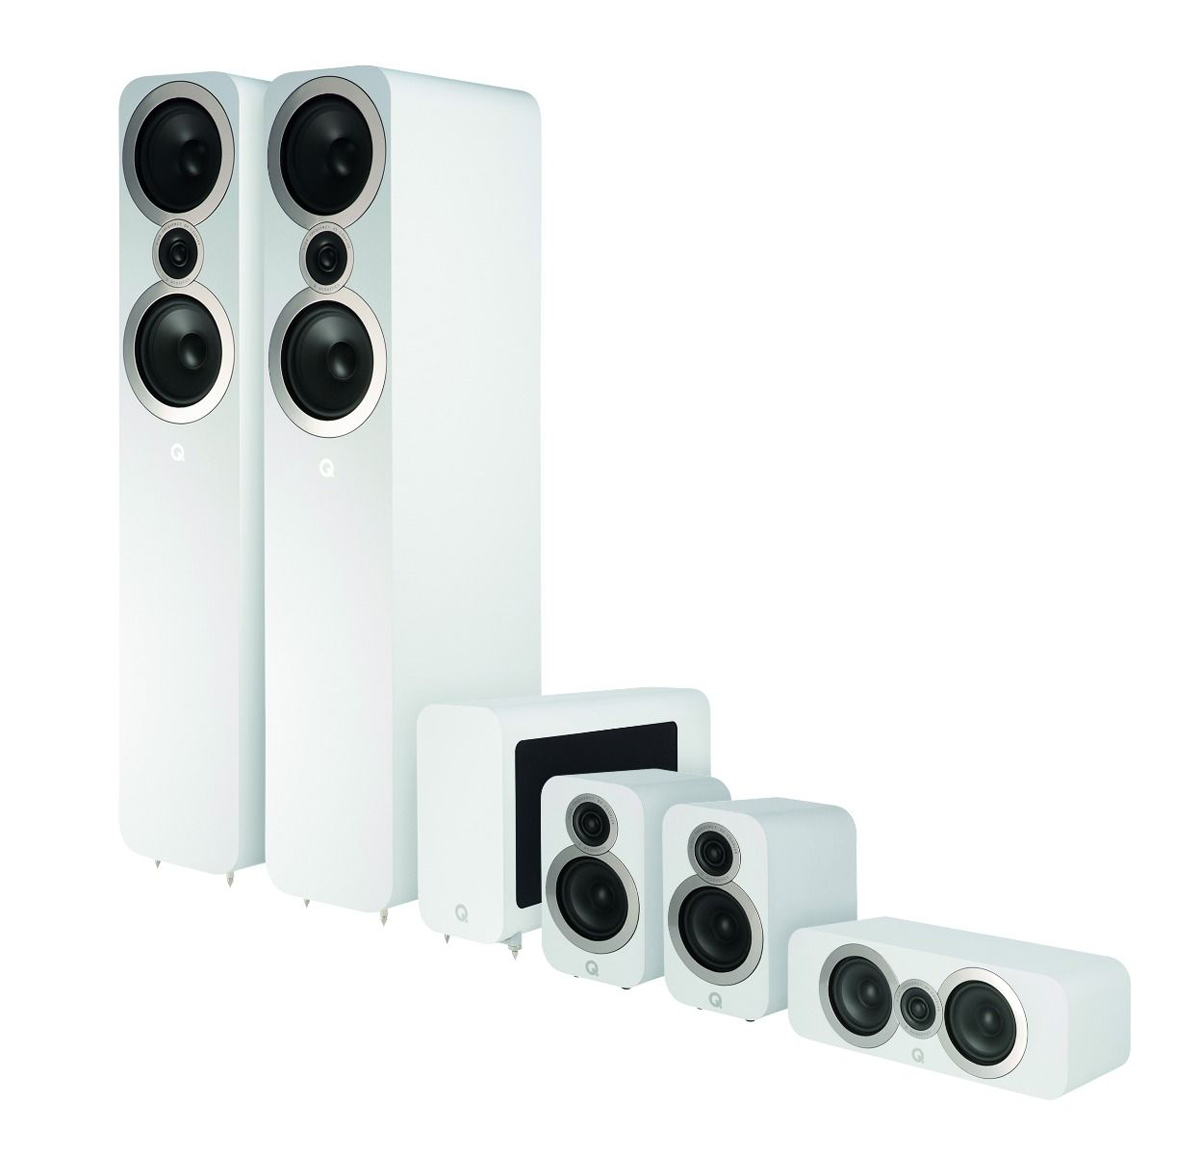 Q-Acoustics 3050i Cinema Pack 5.1 incl. Aktiv-Subwoofer 3060s white